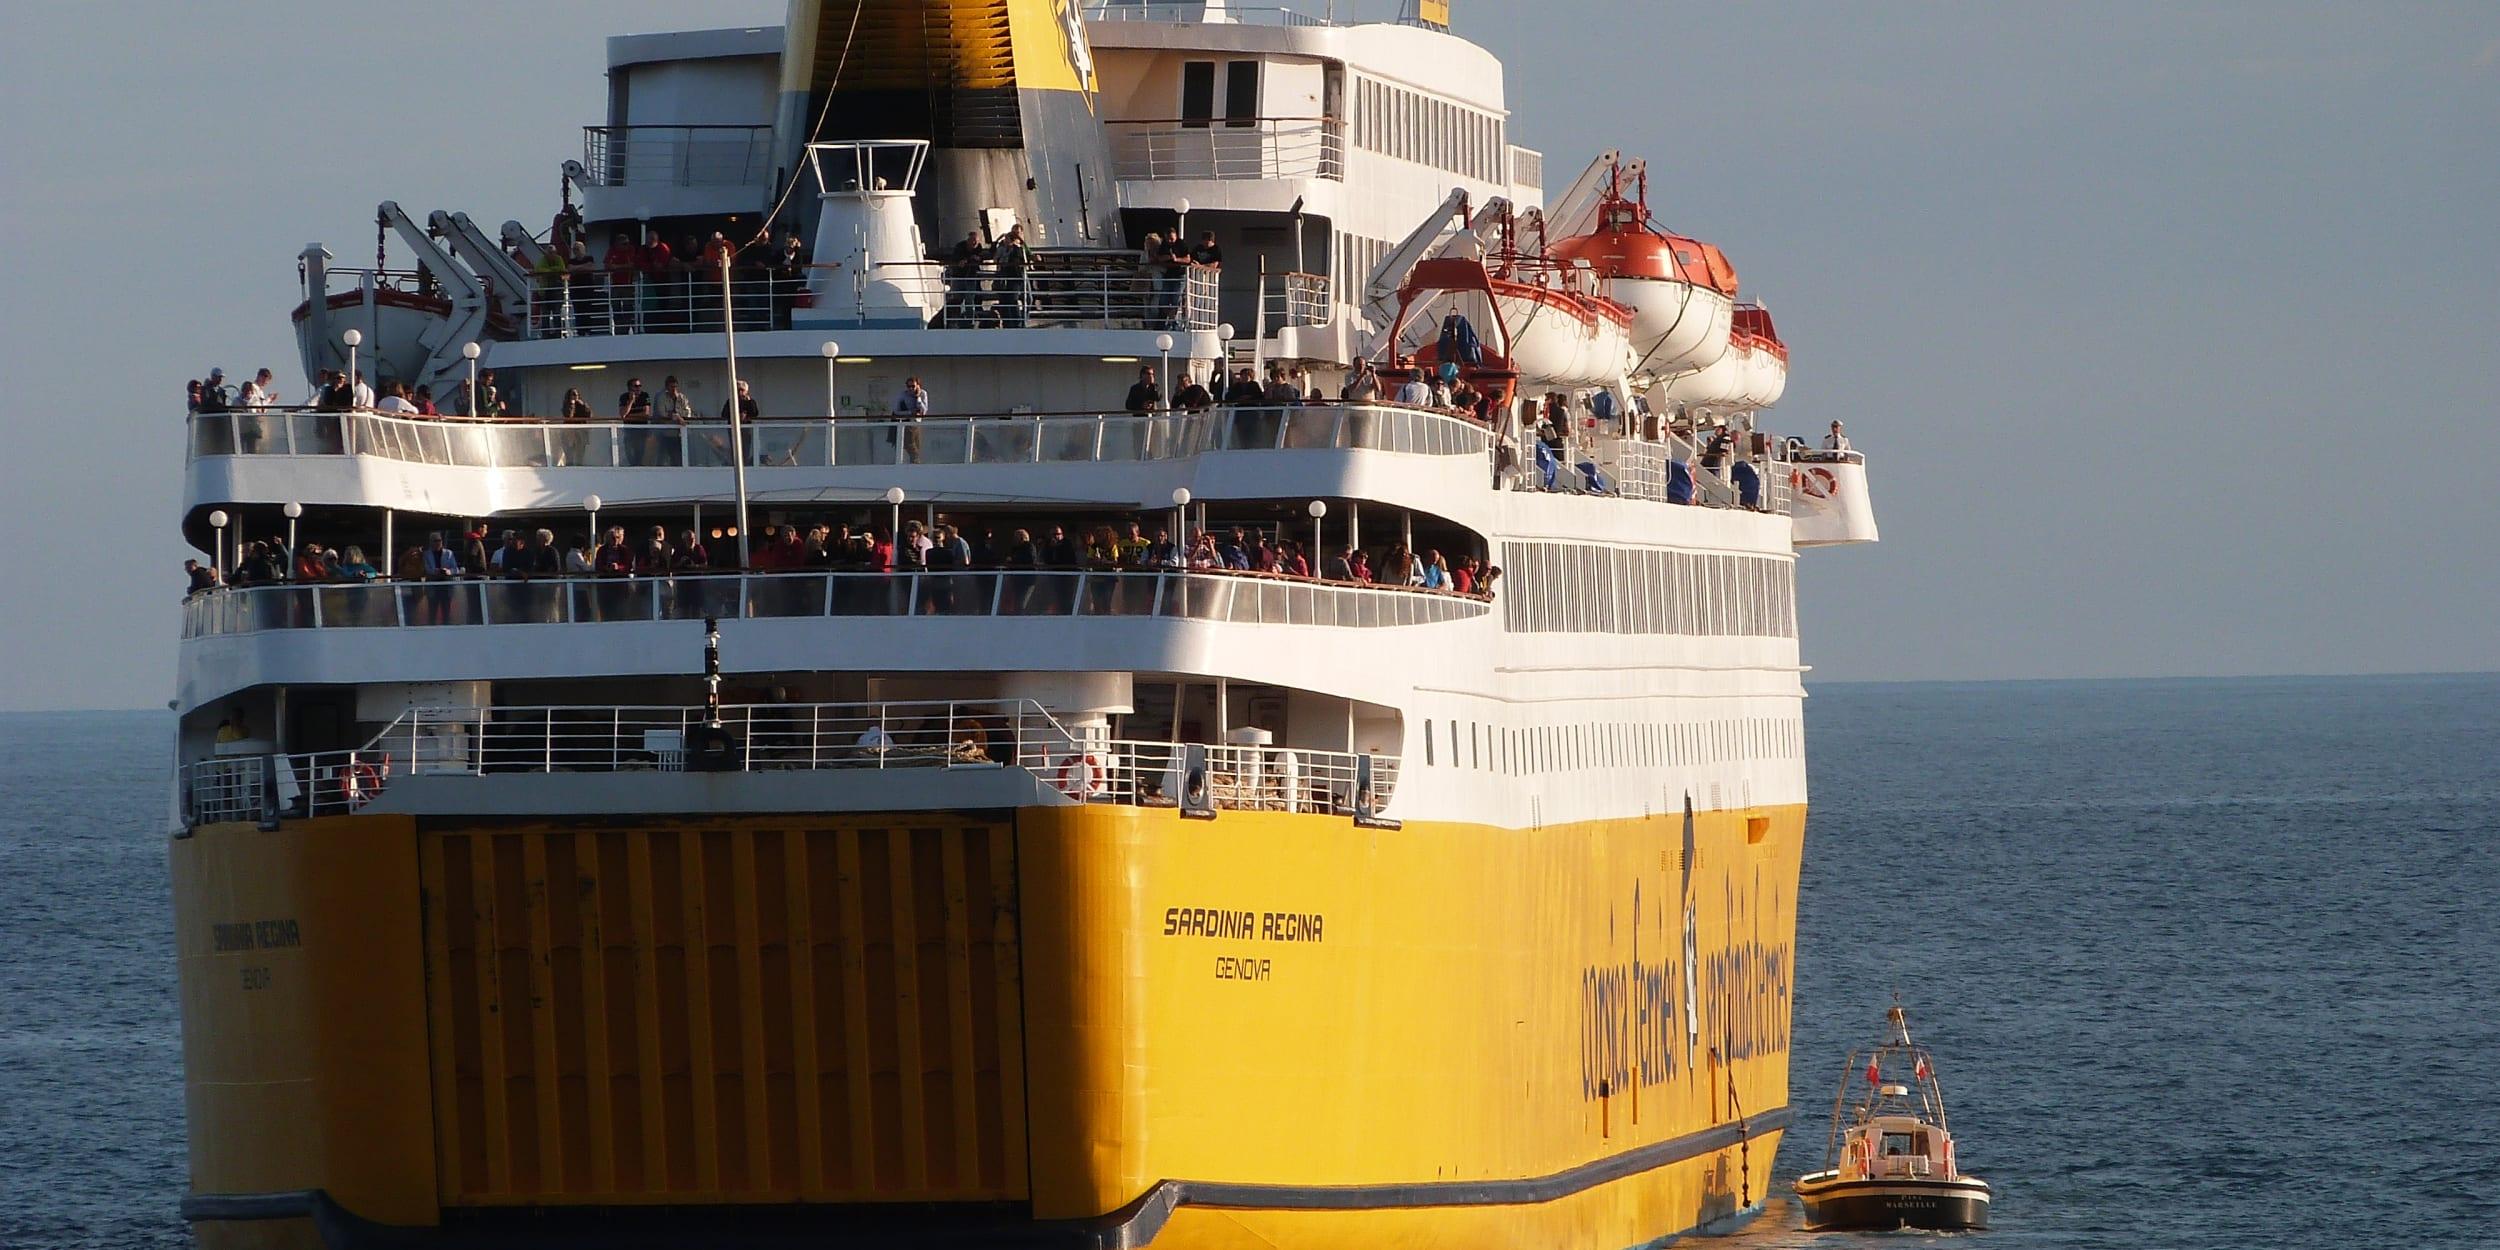 Traghetti - Trasporti marittimi di passeggeri